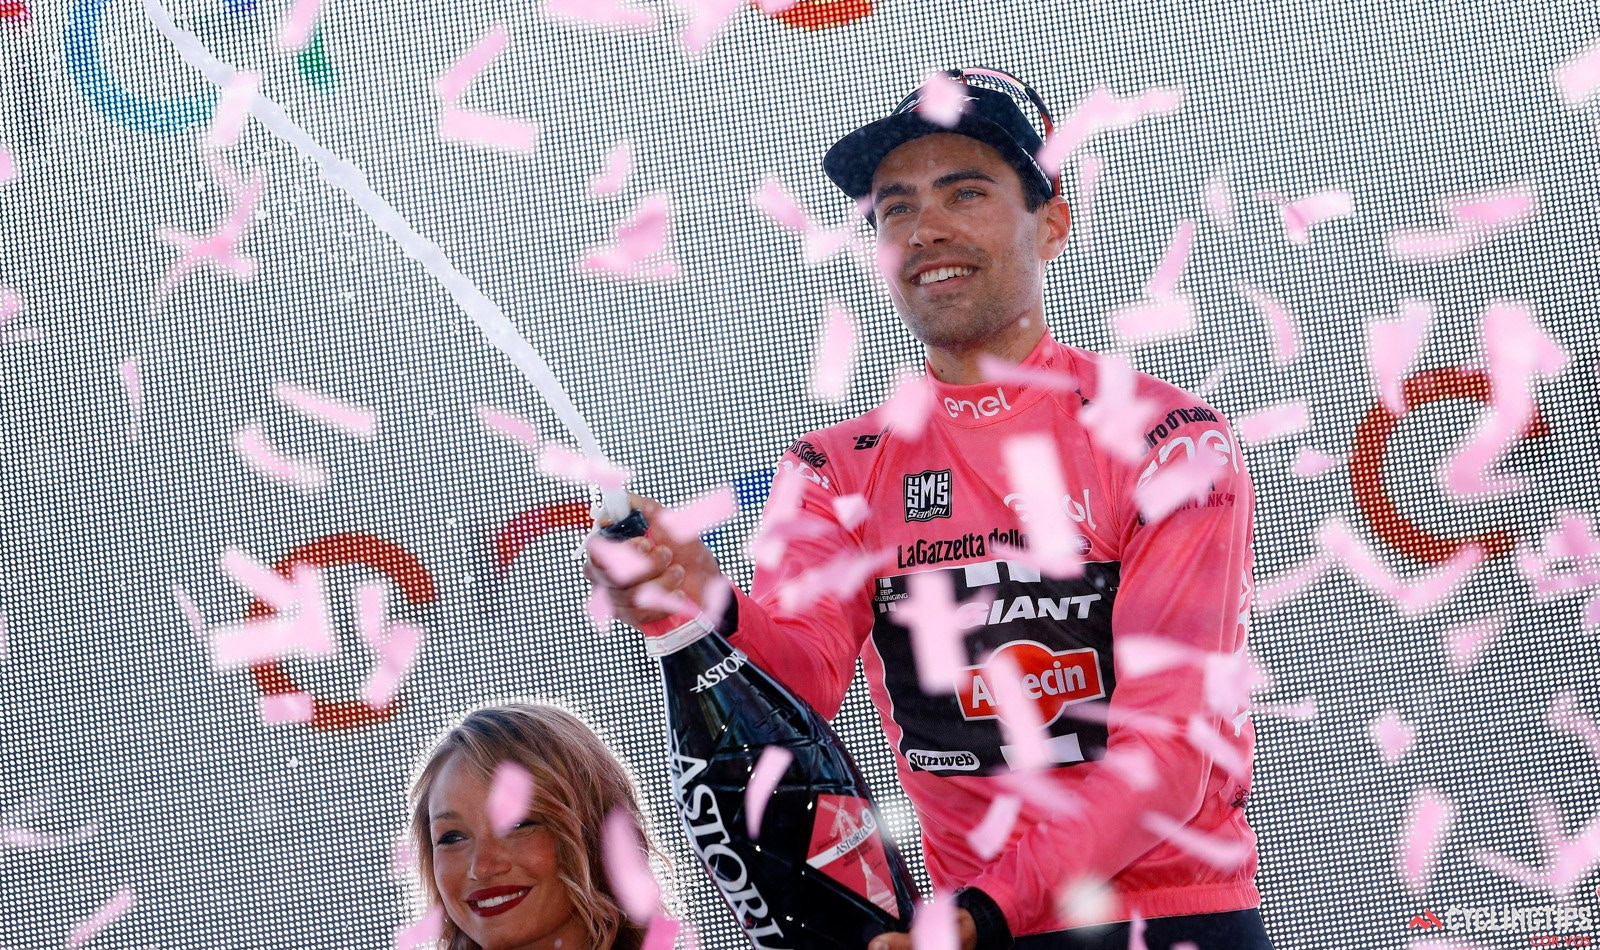 De Giro d'Italia 2016: Nederland kleurt roze